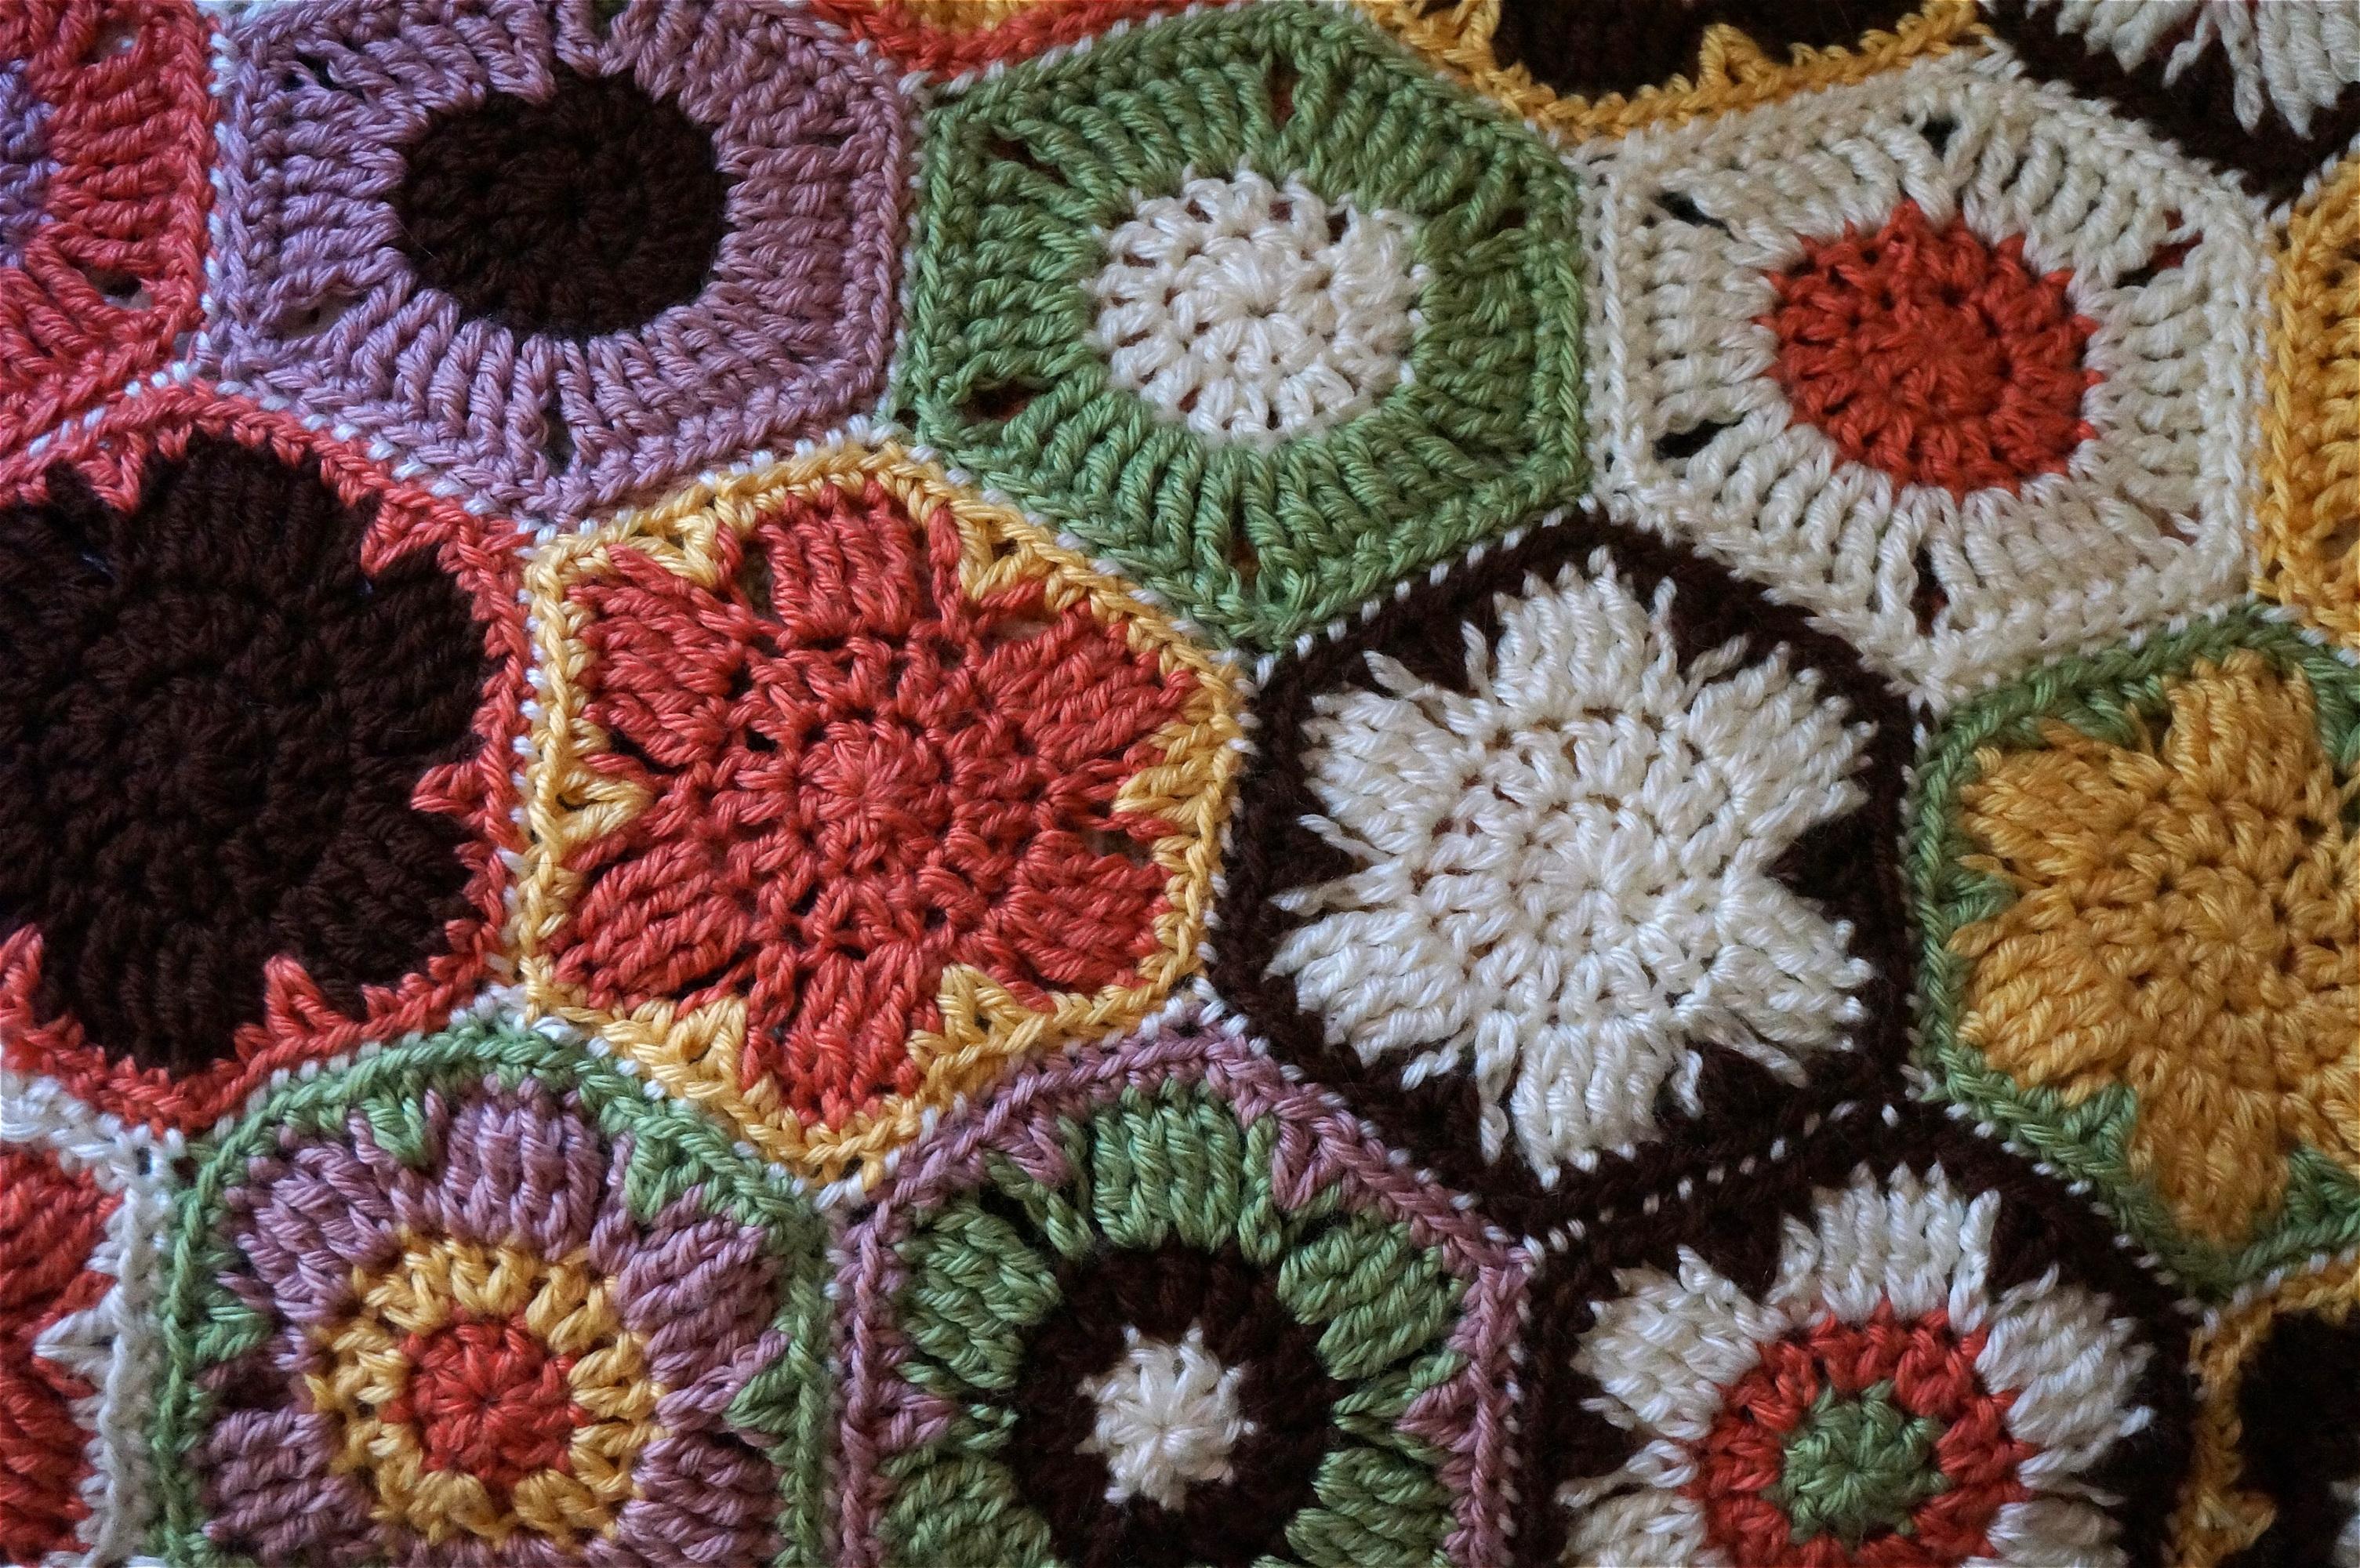 Fotos gratis : flor, patrón, arte, vistoso, hilo, material, Flores ...